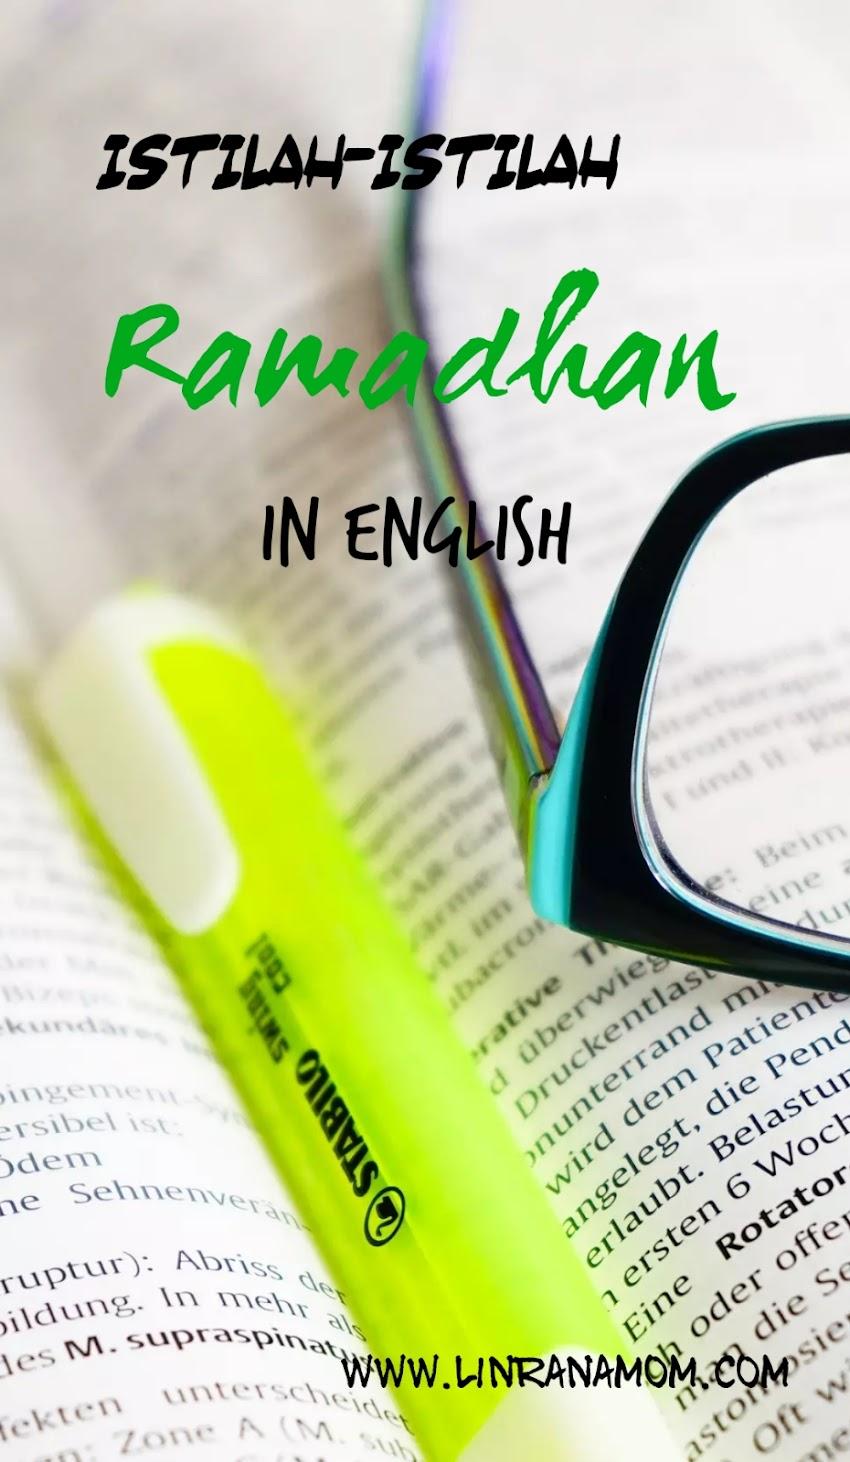 Istilah-istilah Ramadhan in English